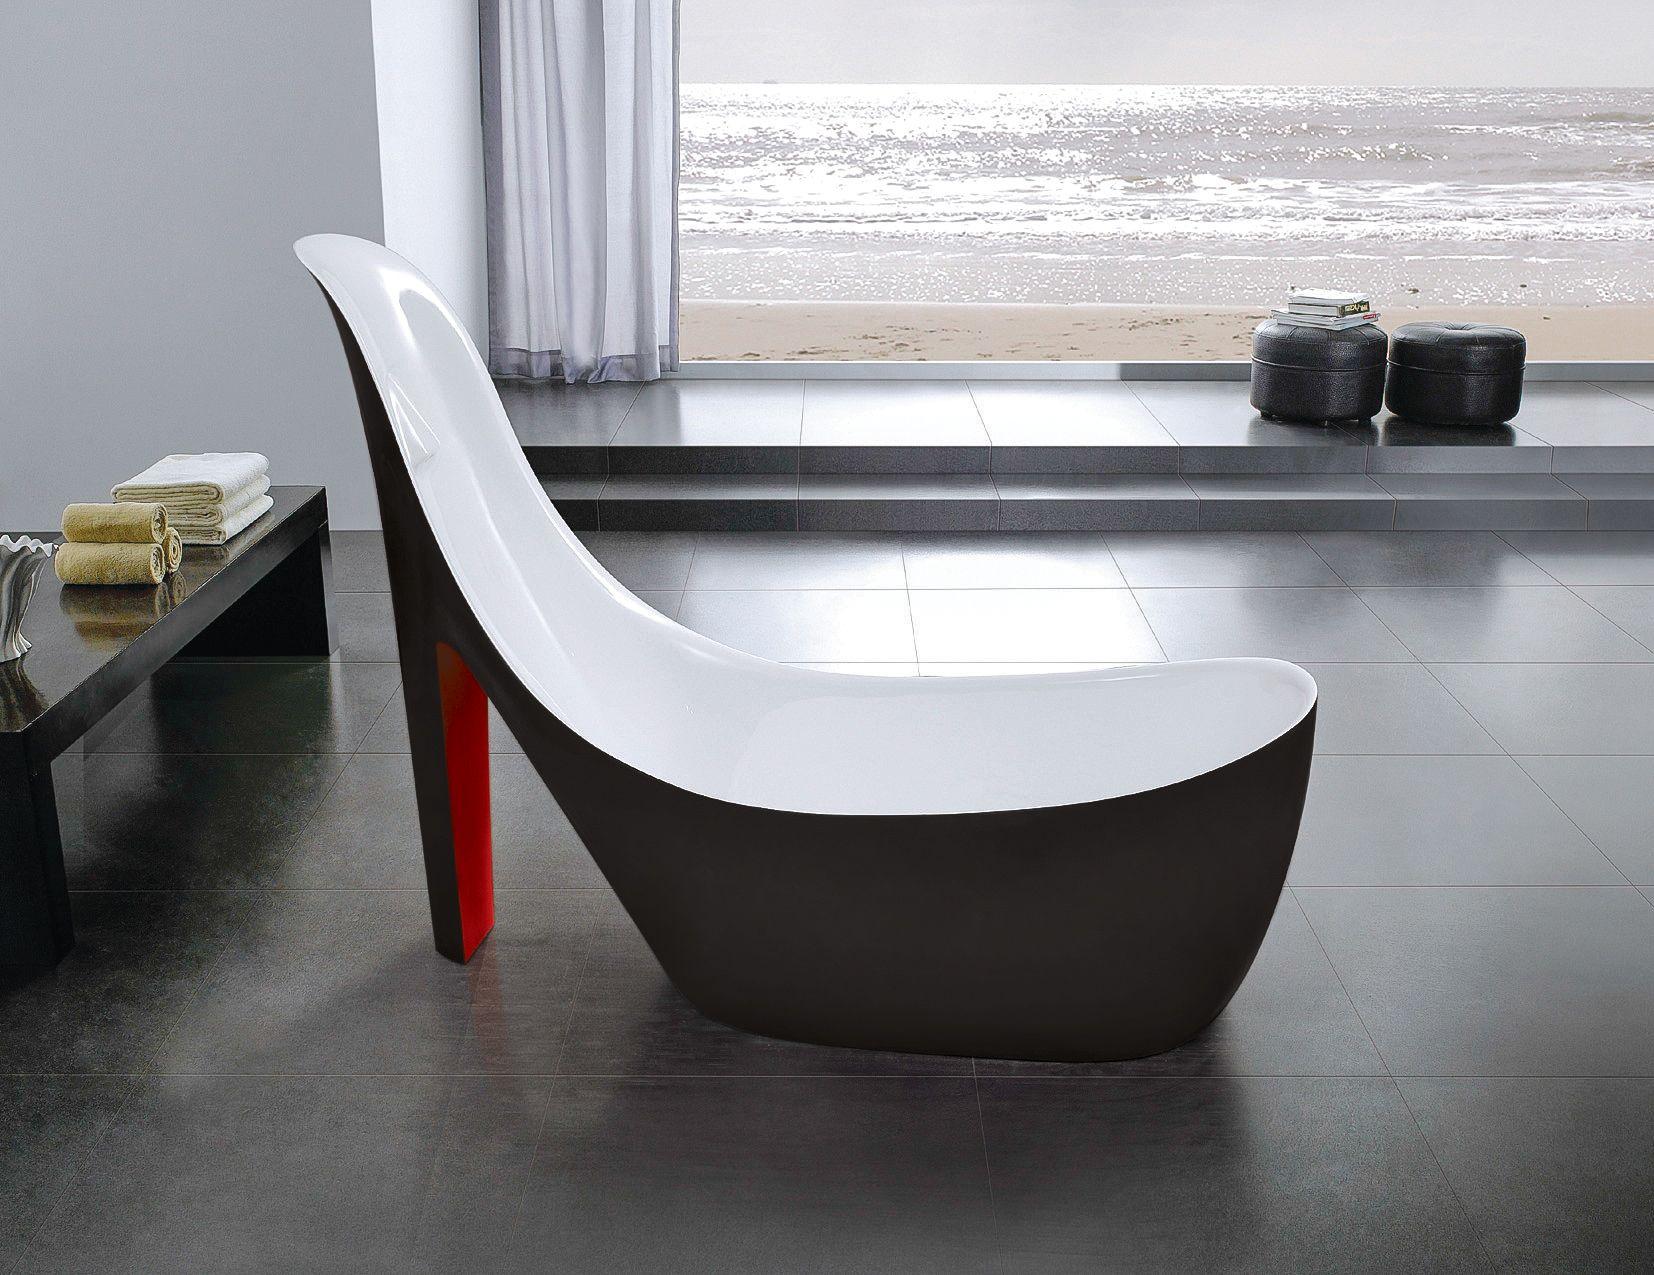 Bathtubs Toilets Showers Sinks Faucets Free Standing Bath Tub Unique Bathroom Design